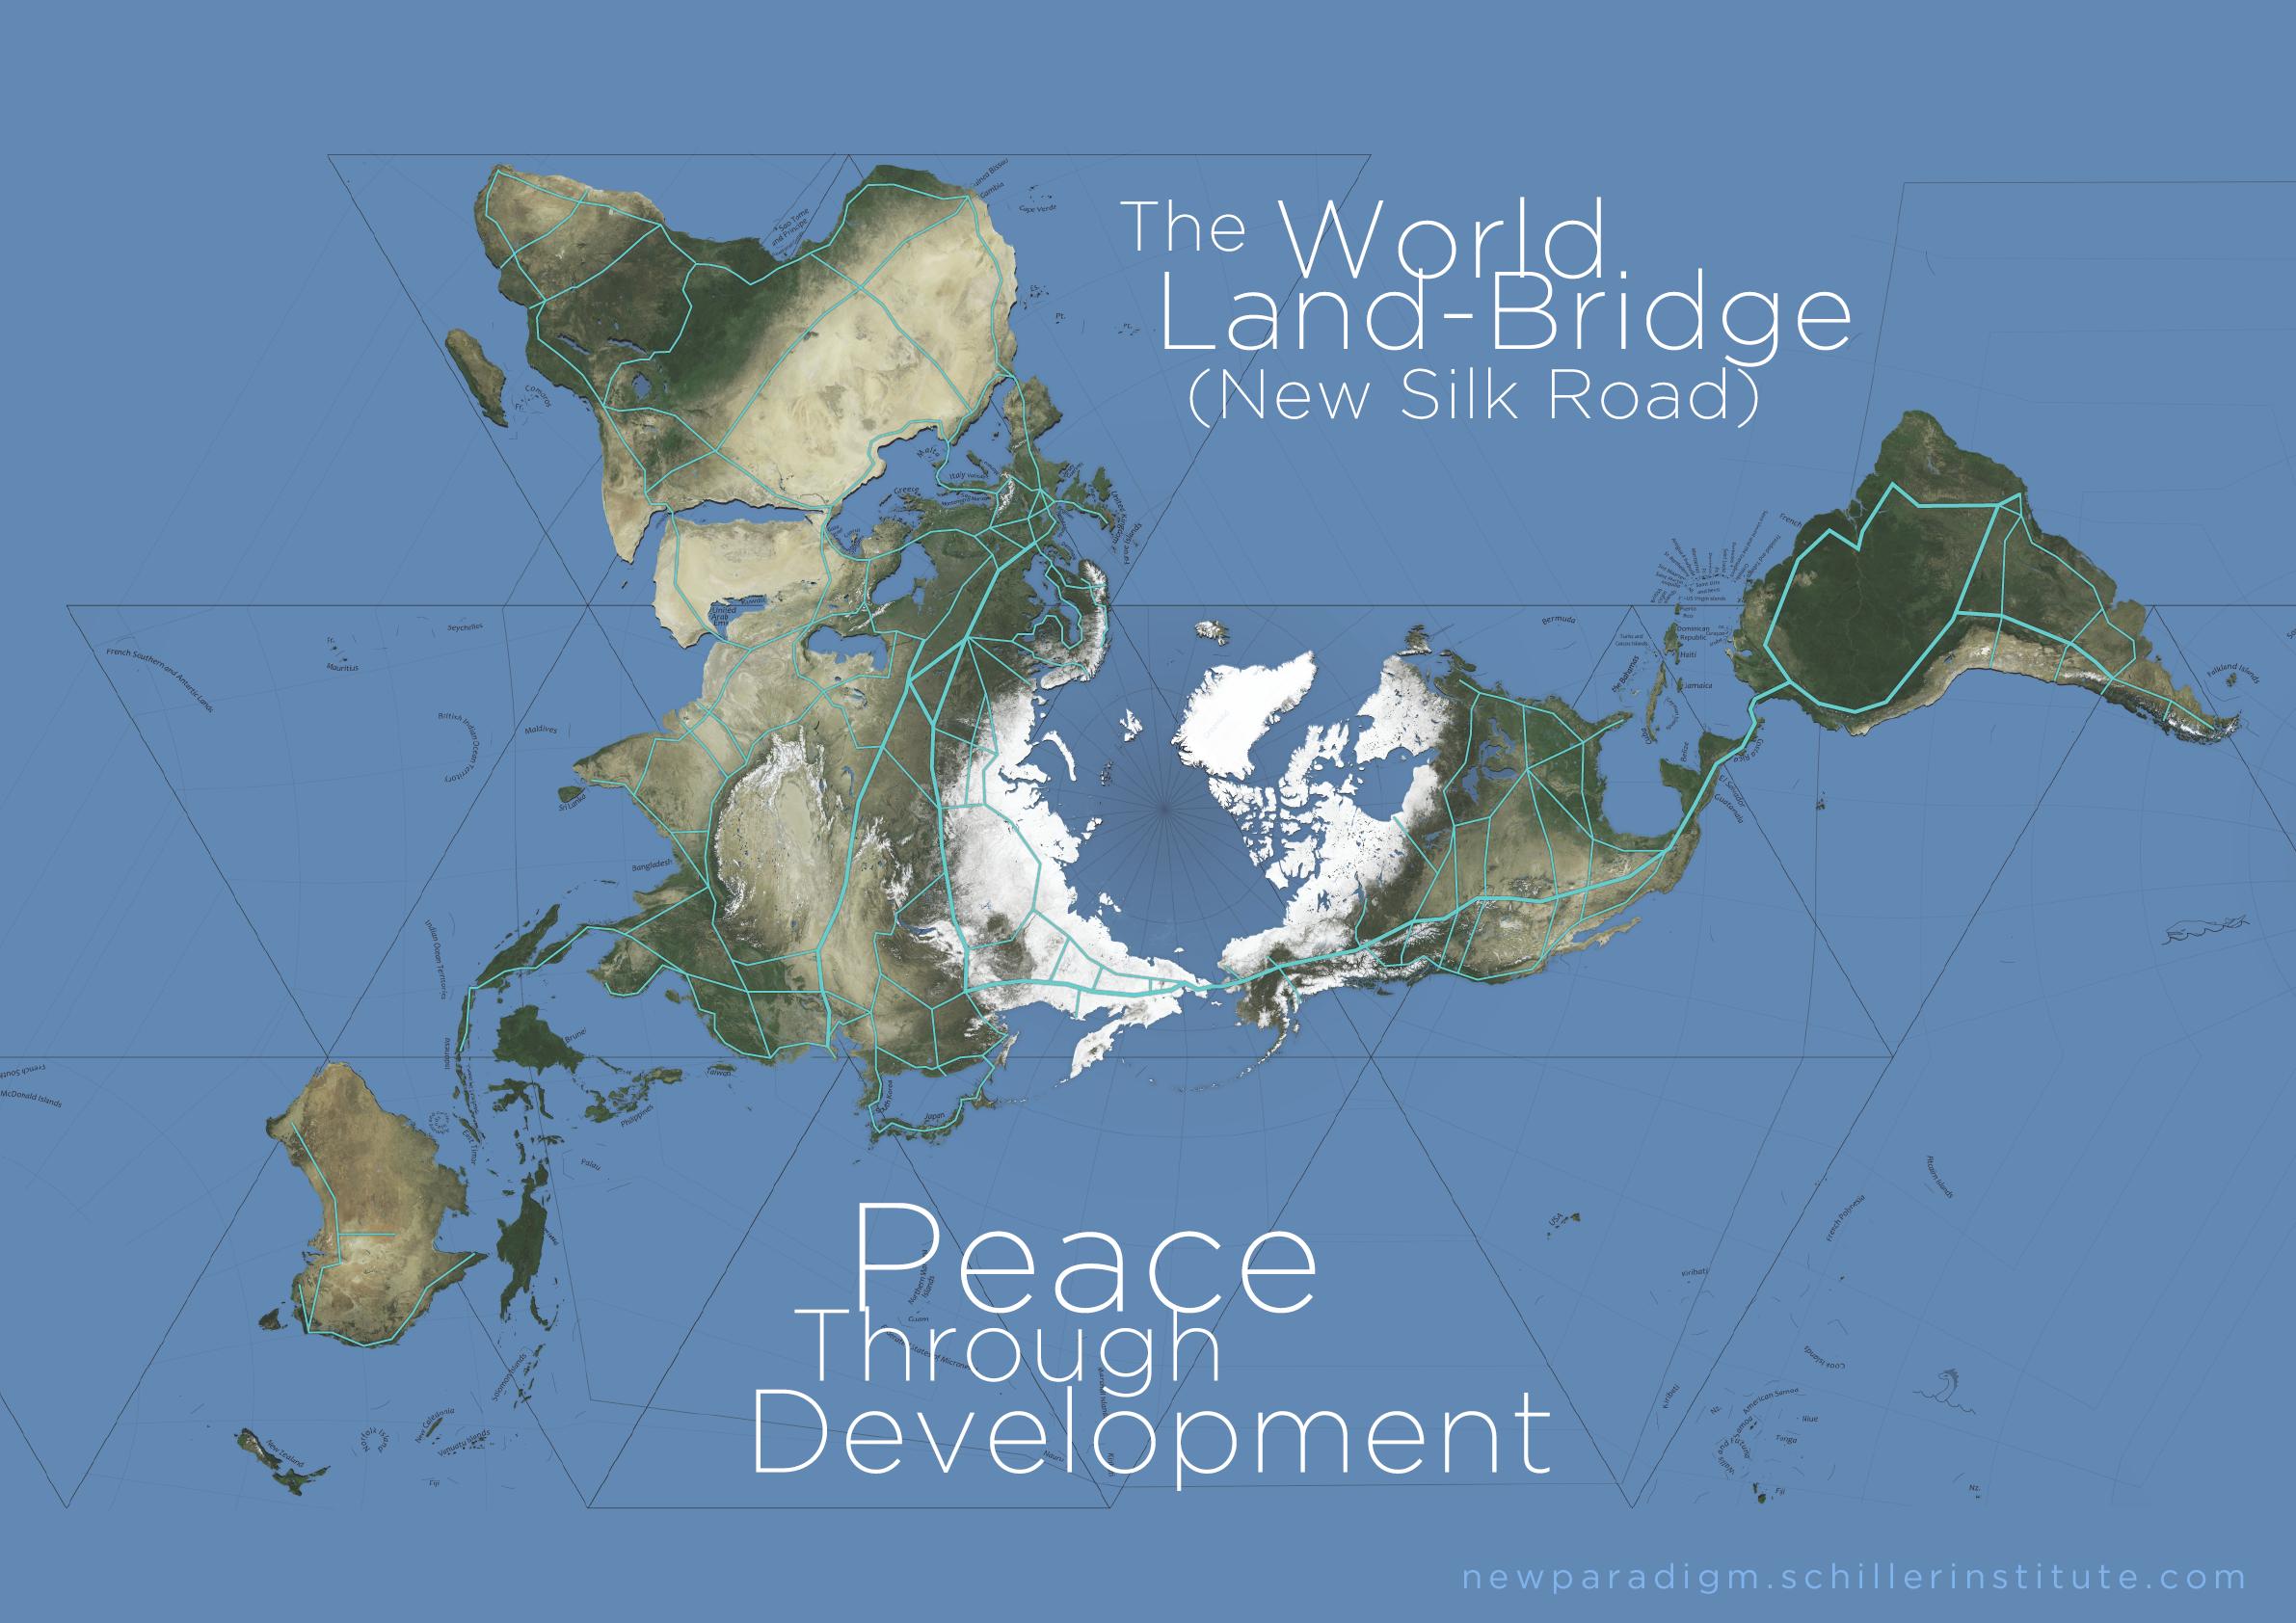 The World Land-Bridge